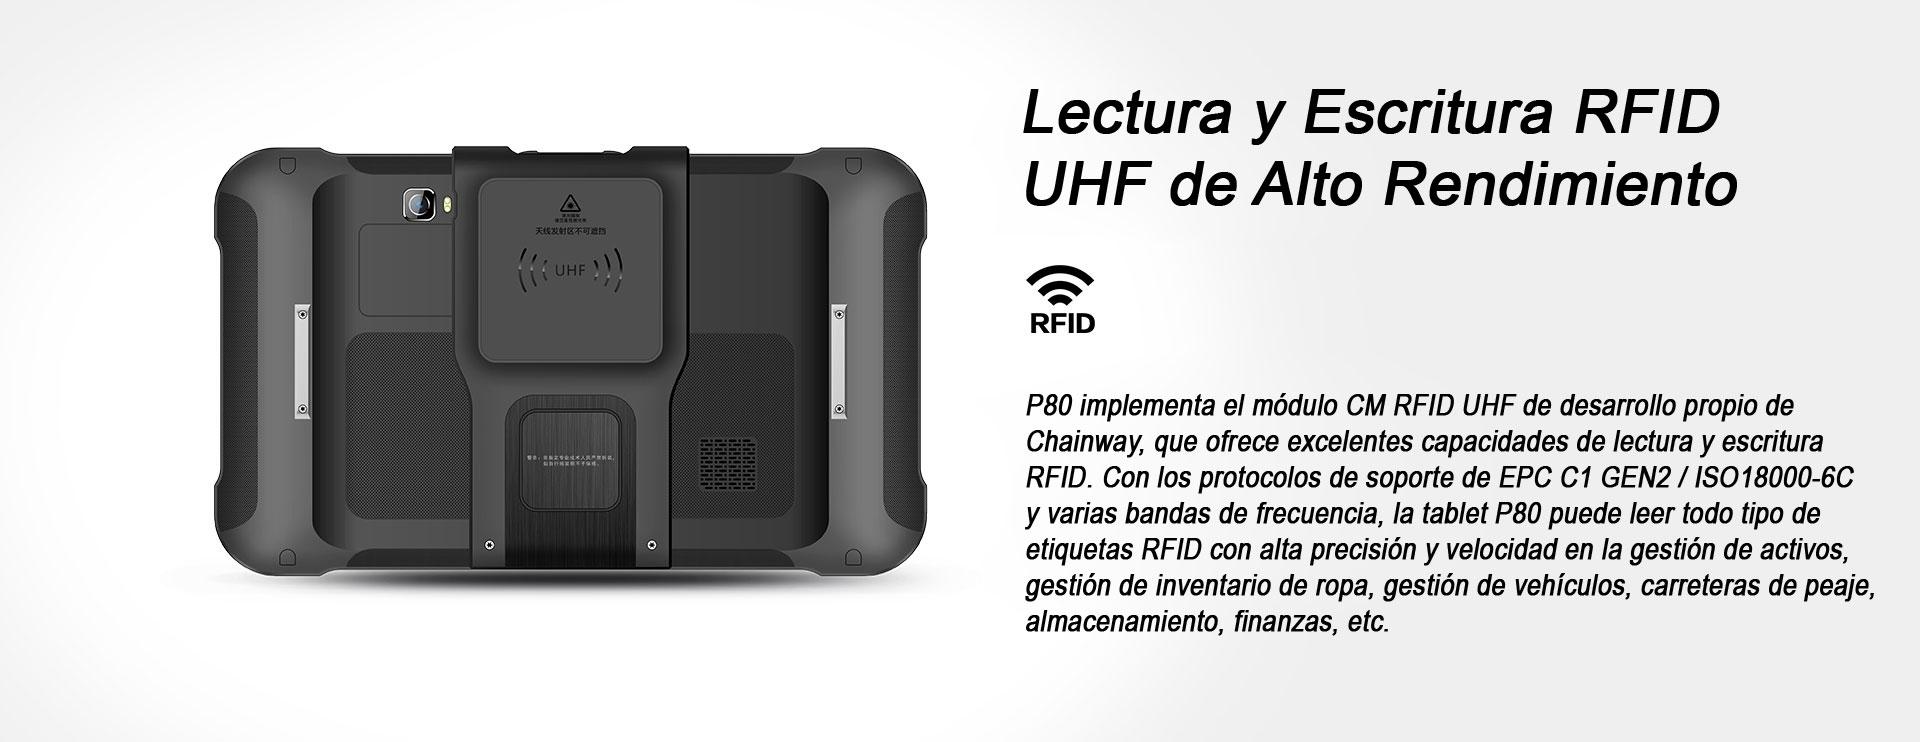 TABLET INDUSTRIAL P80 RFID UHF CHAINWAY